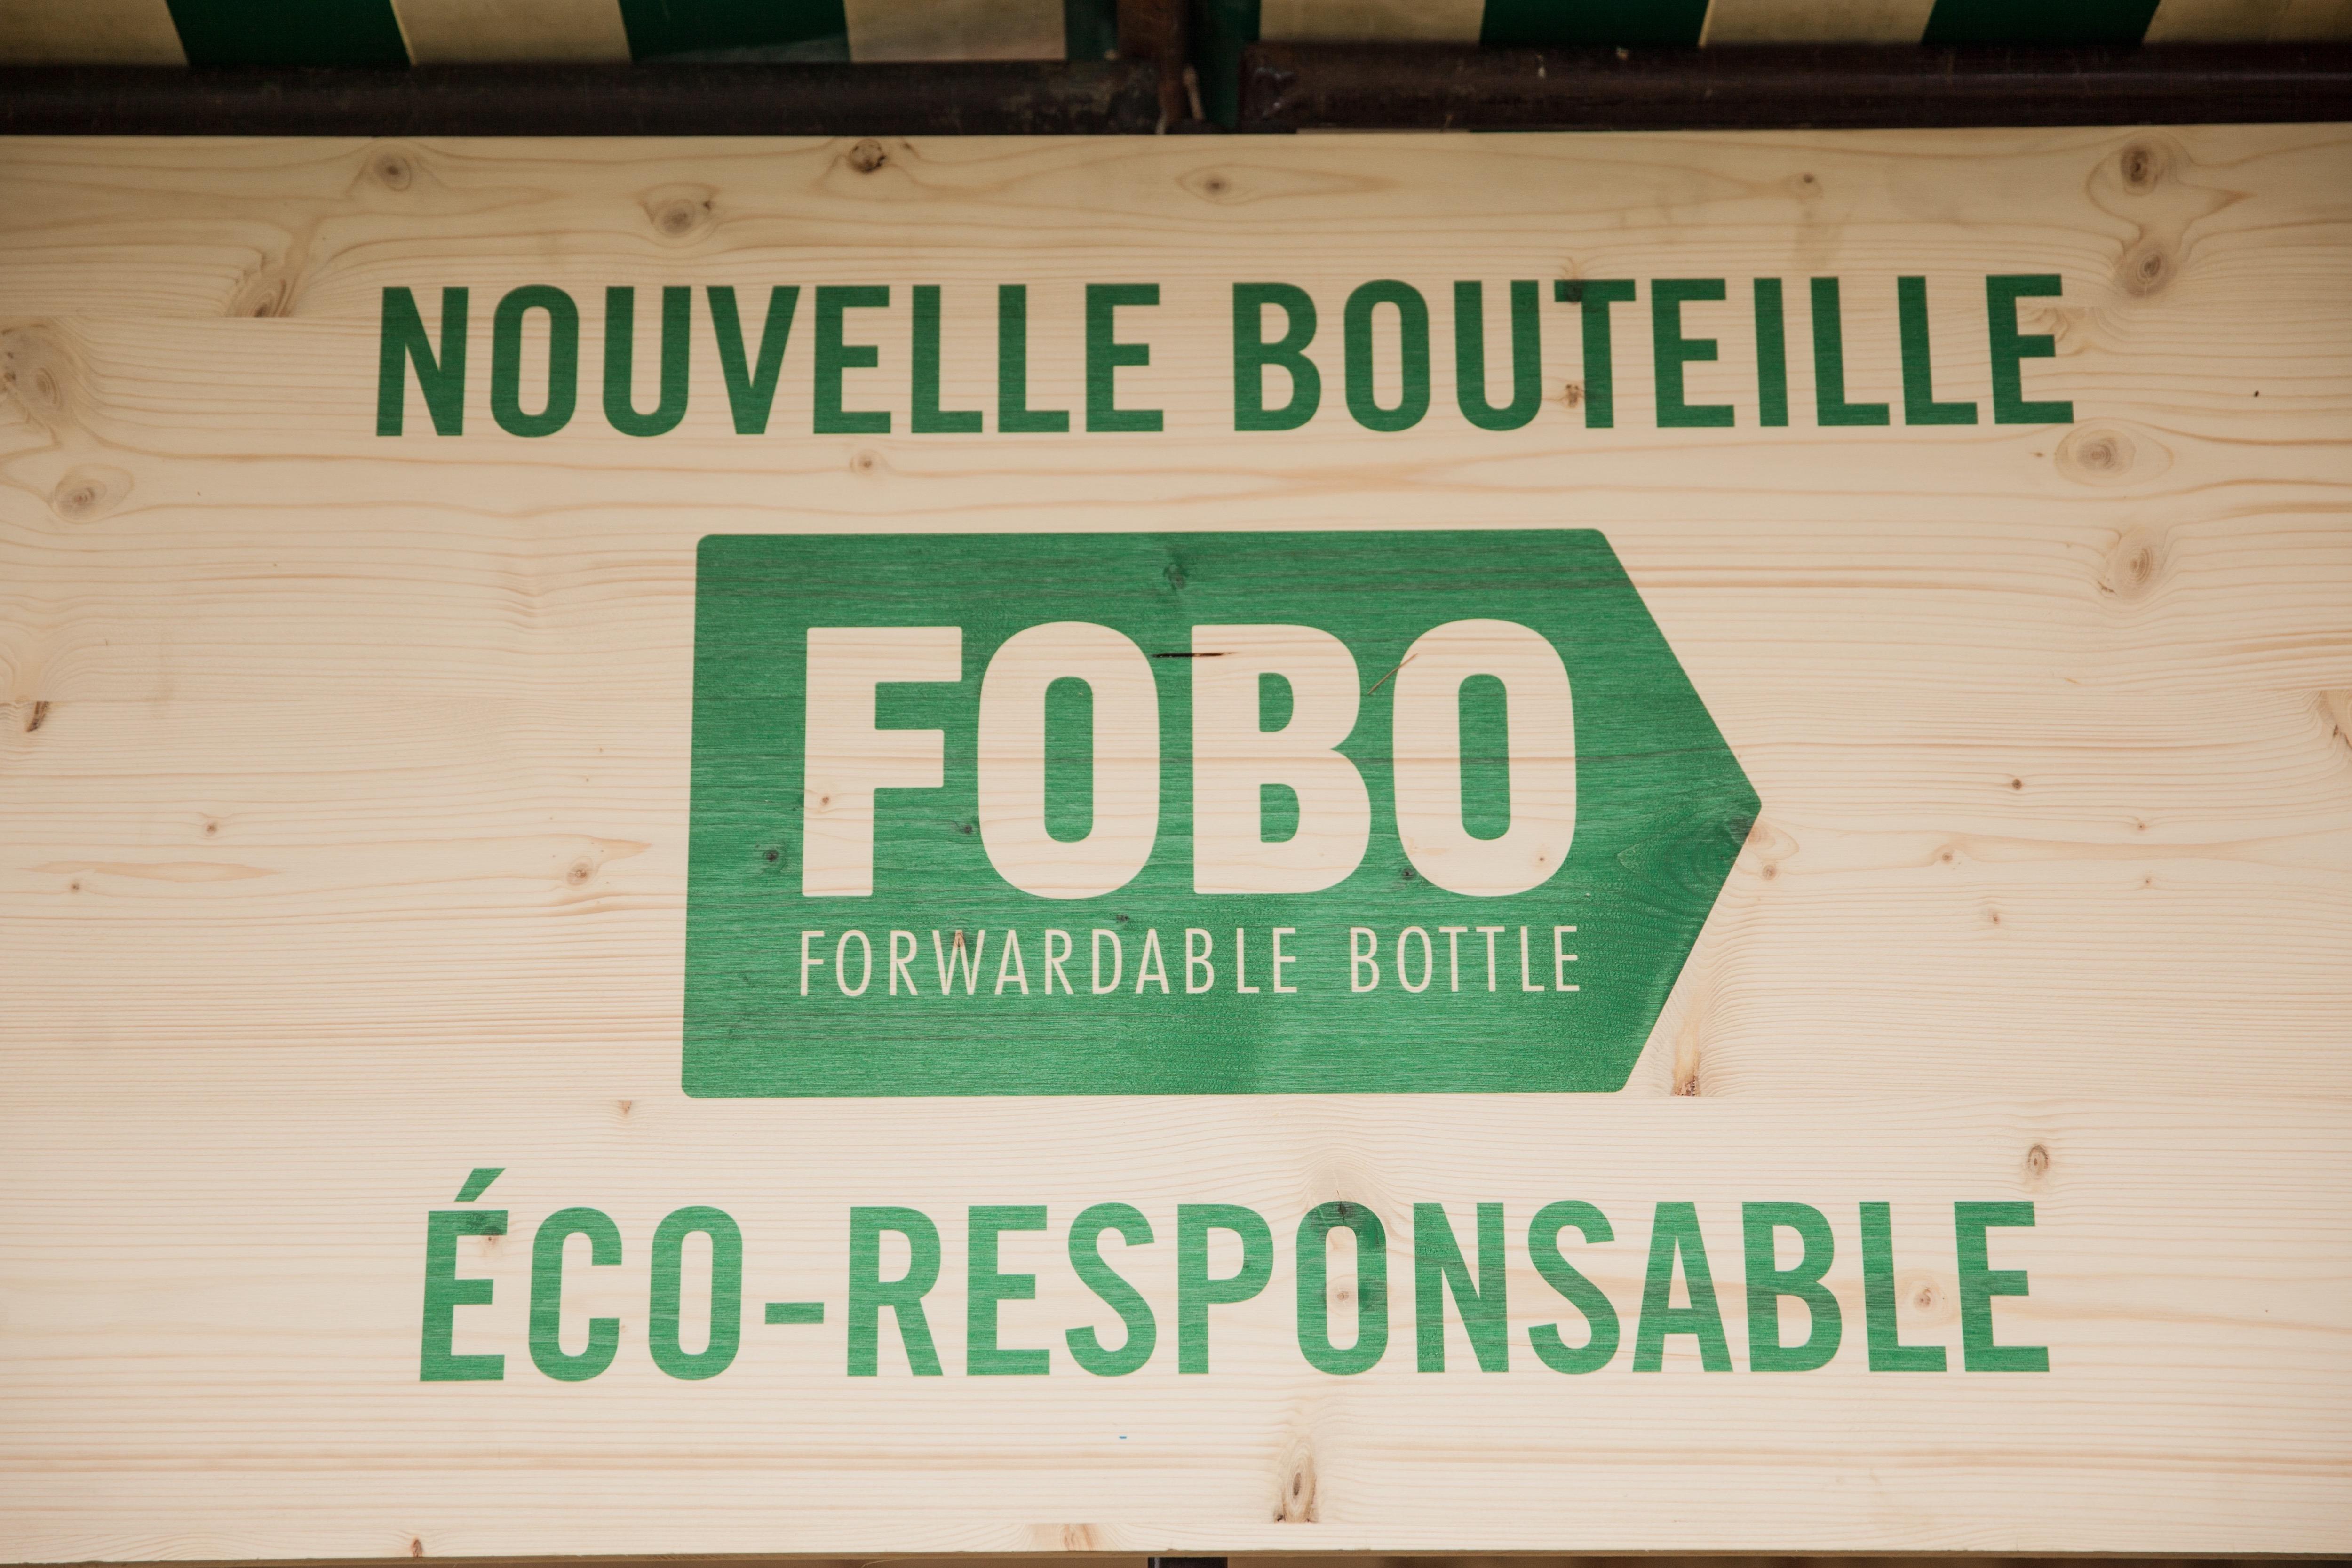 bouteille-fobo-heineken-2